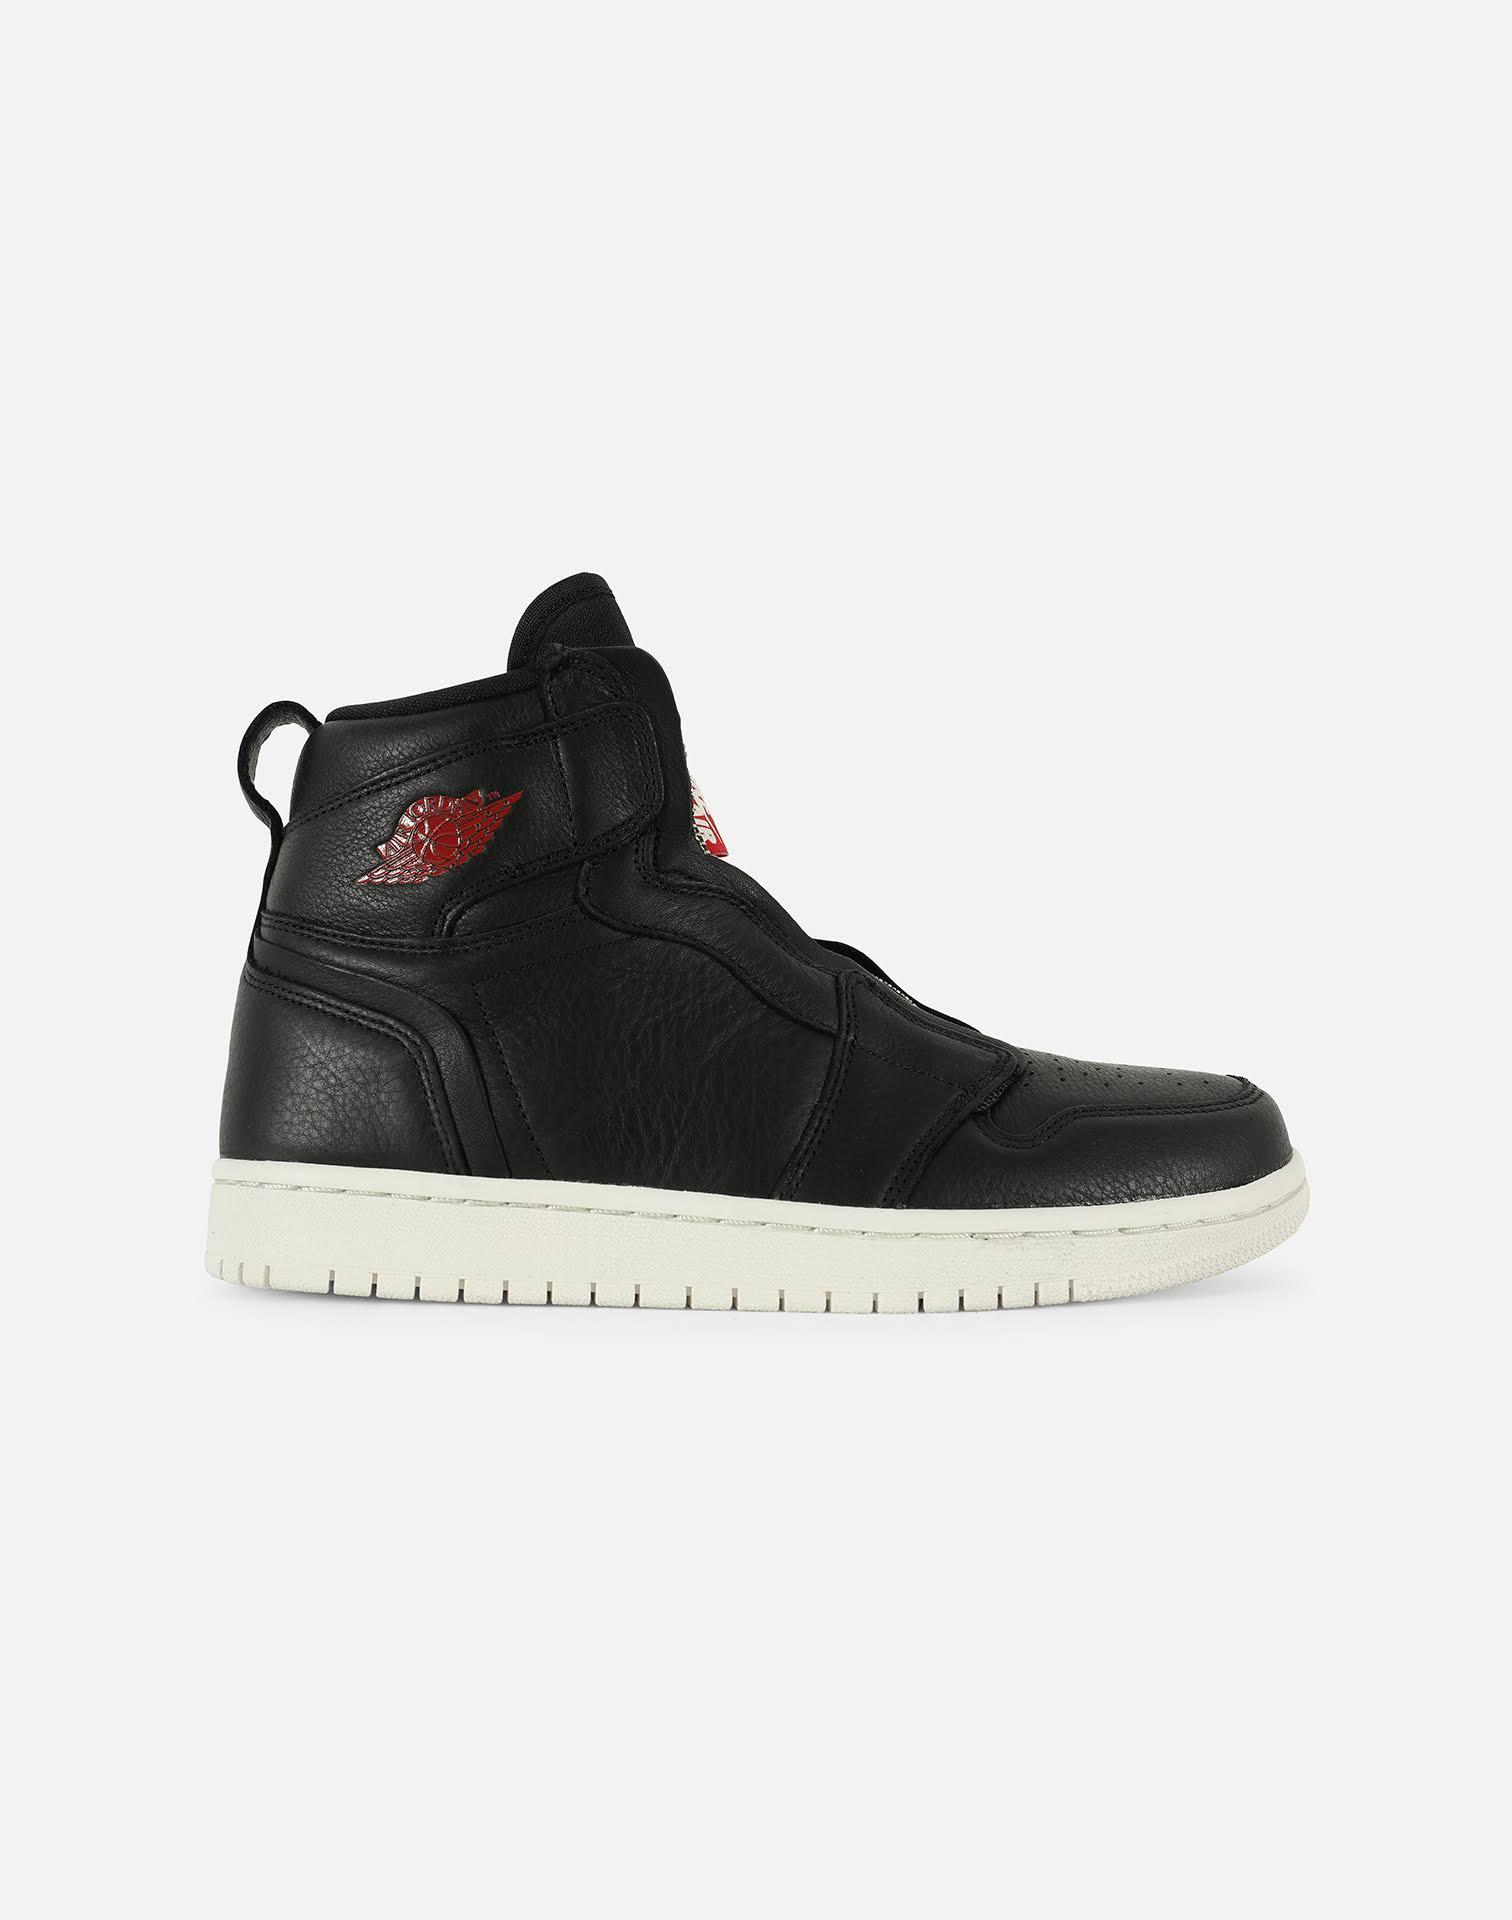 High Premium Zipper 1 Jordan 11 Schuhe At0575006 Größe Damen Retro gvHAIn